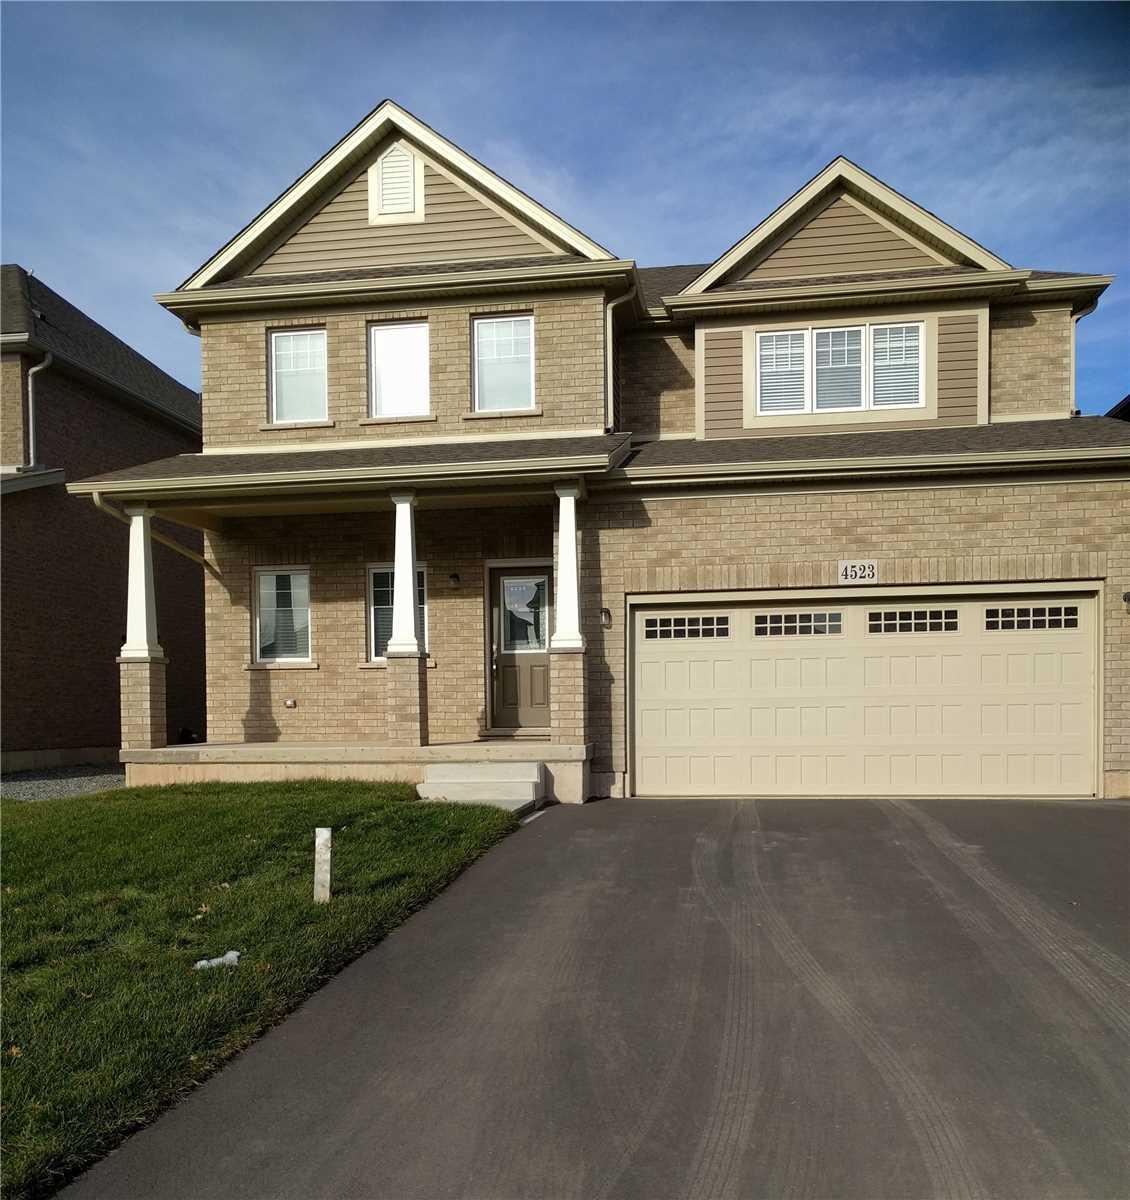 4523 Shuttleworth Dr, Niagara Falls X4385459